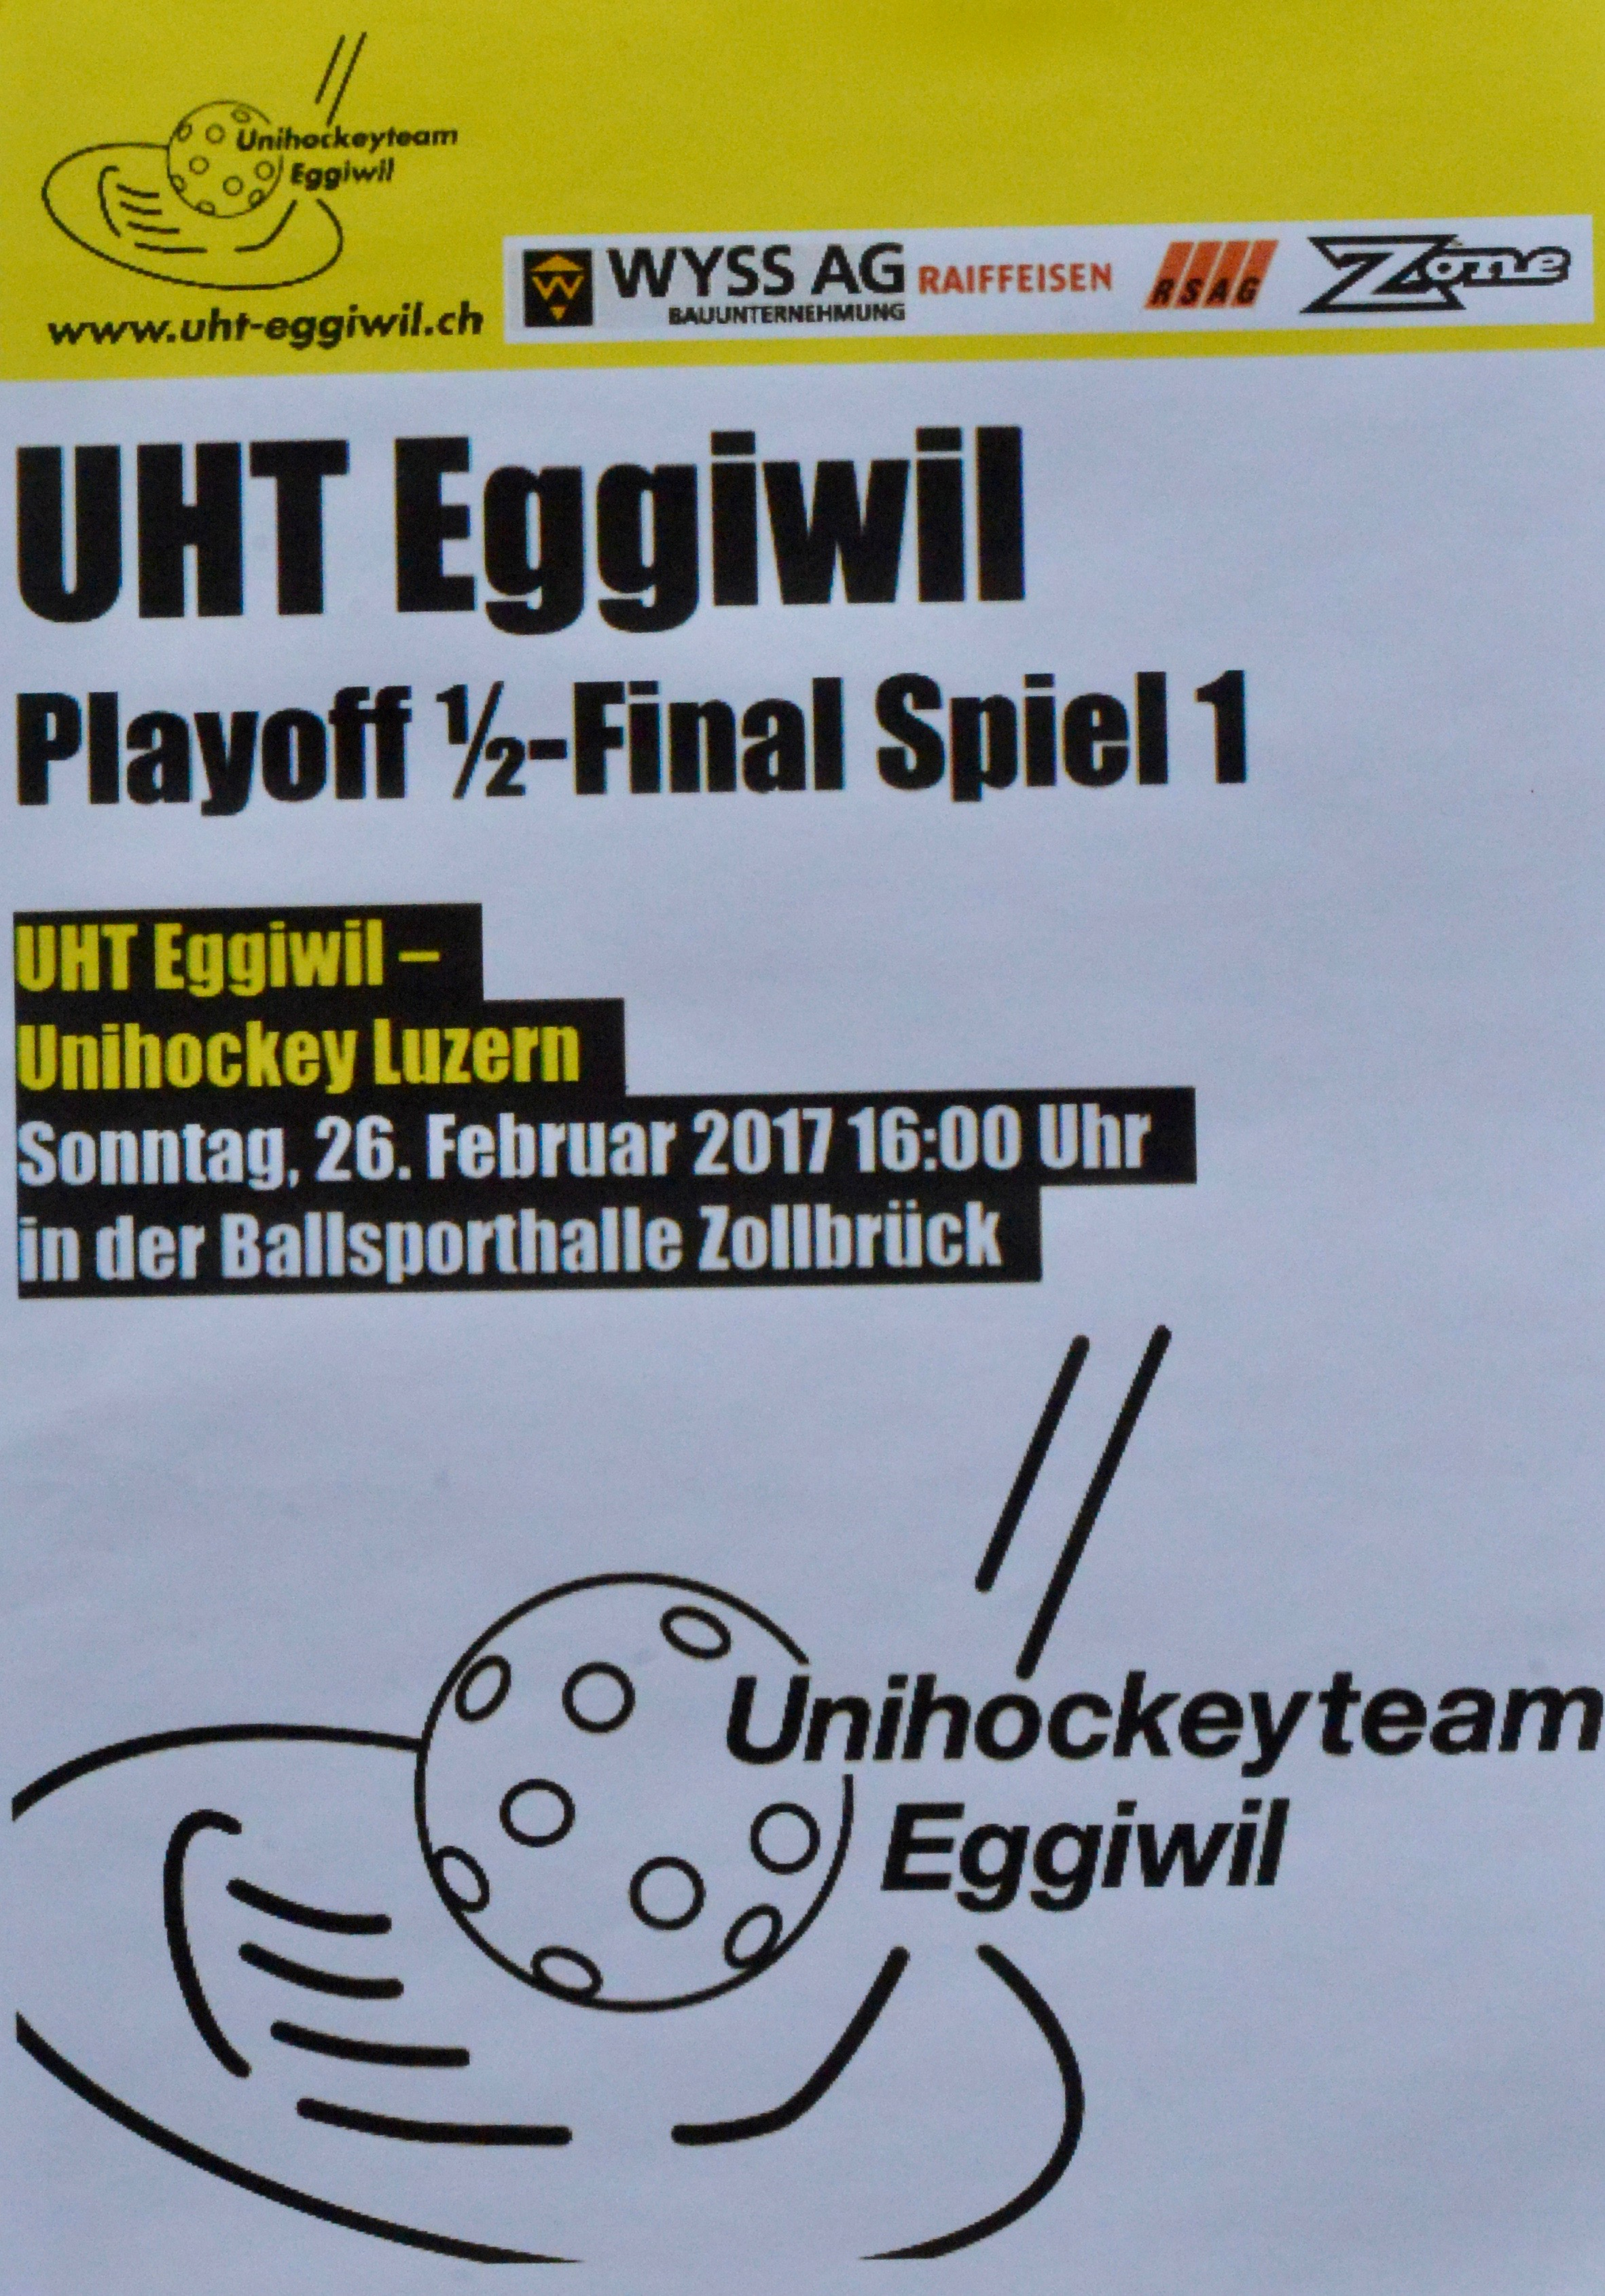 Herren I - Unihockey Luzern Halbfinal Spiel I Saison 2016/17